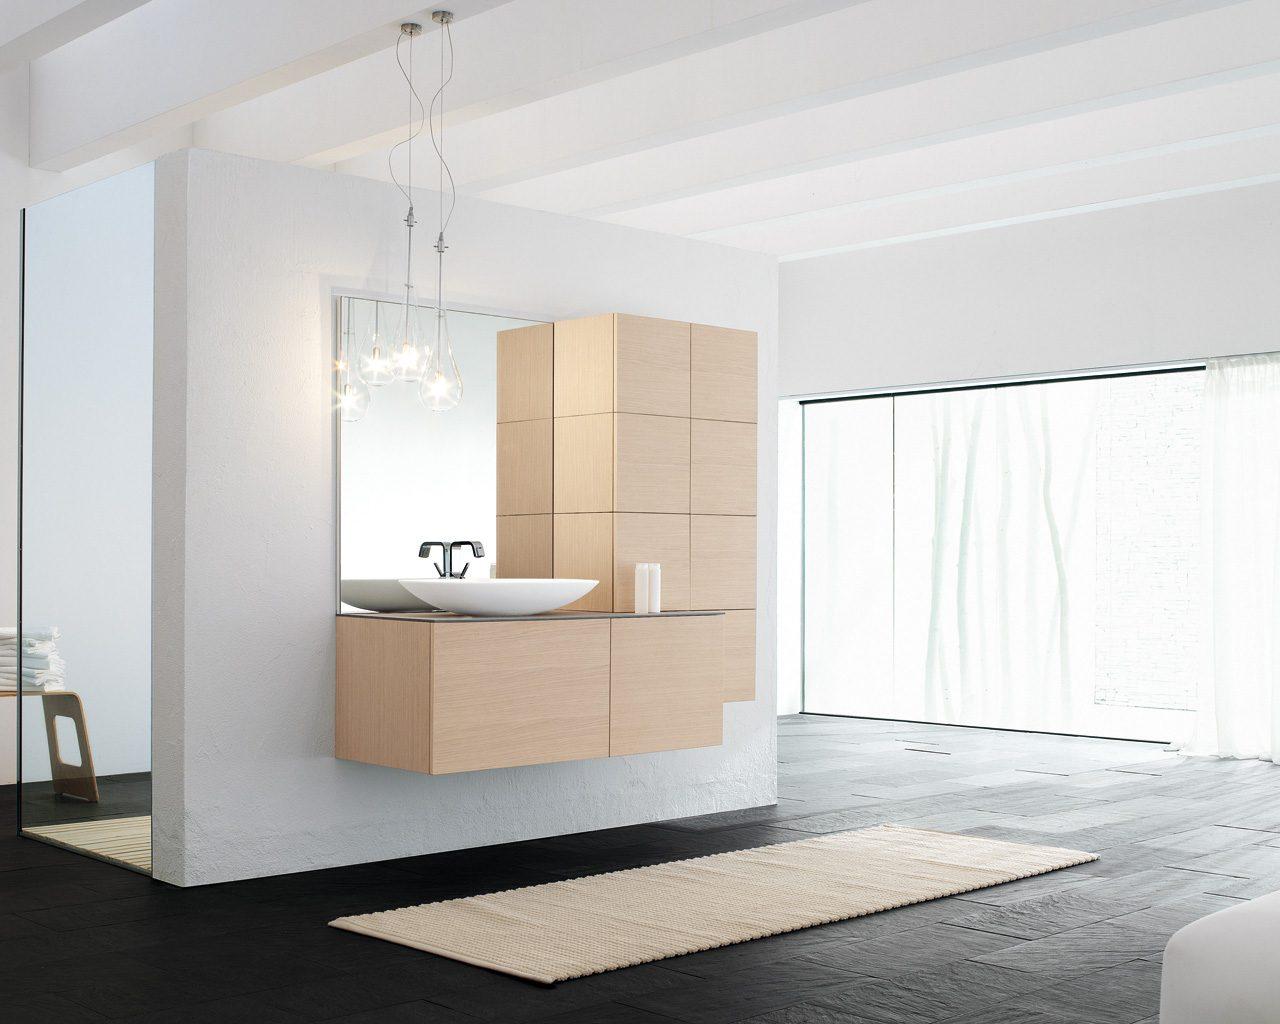 Cuartos de ba o minimalistas for Banos para cuartos